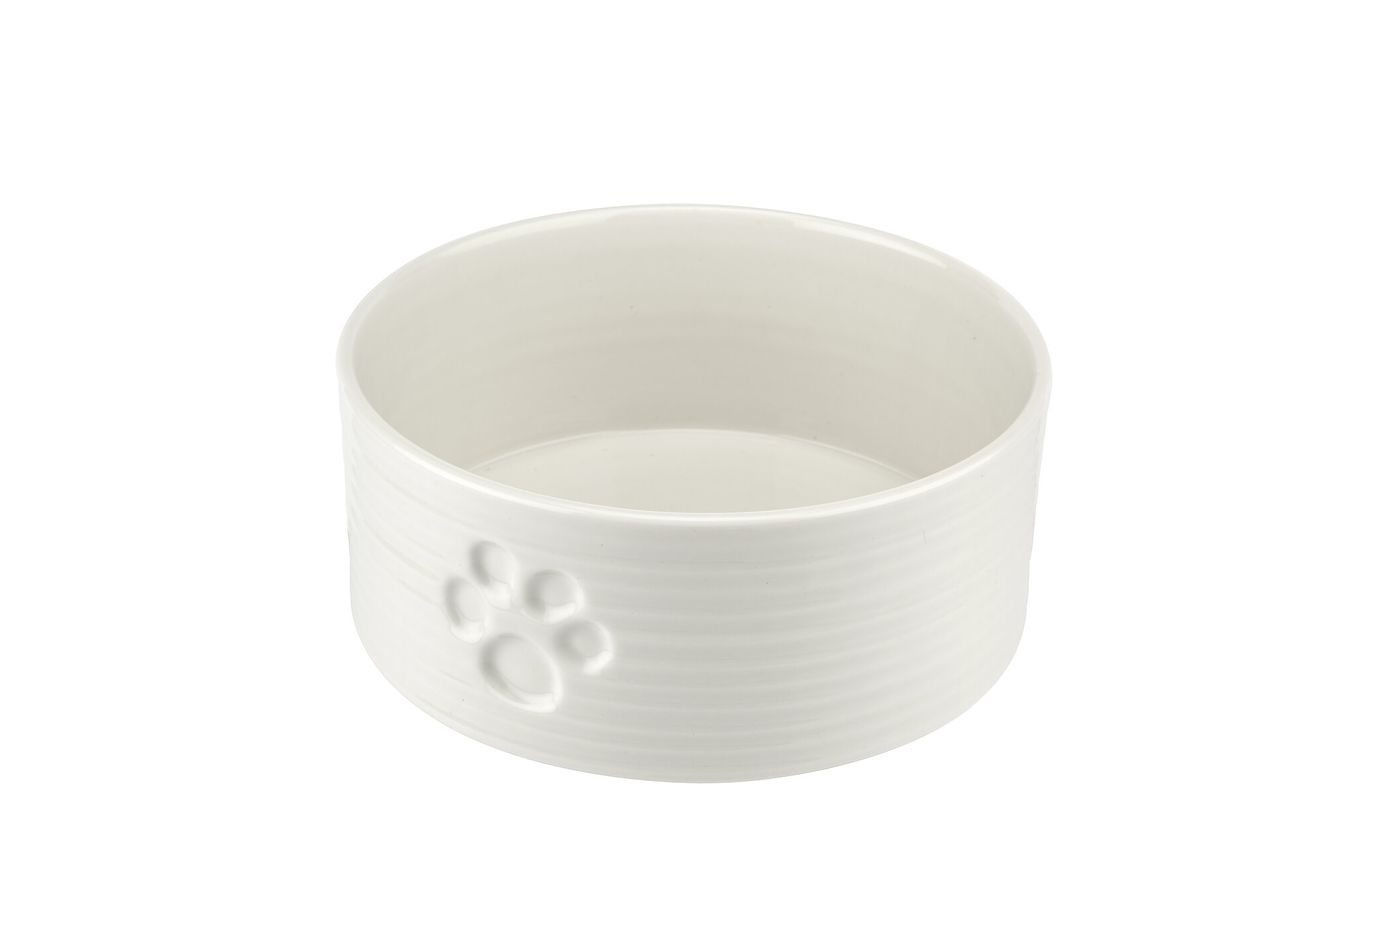 Sophie Conran for Portmeirion White Pet Bowl 15.25cm thumb 2